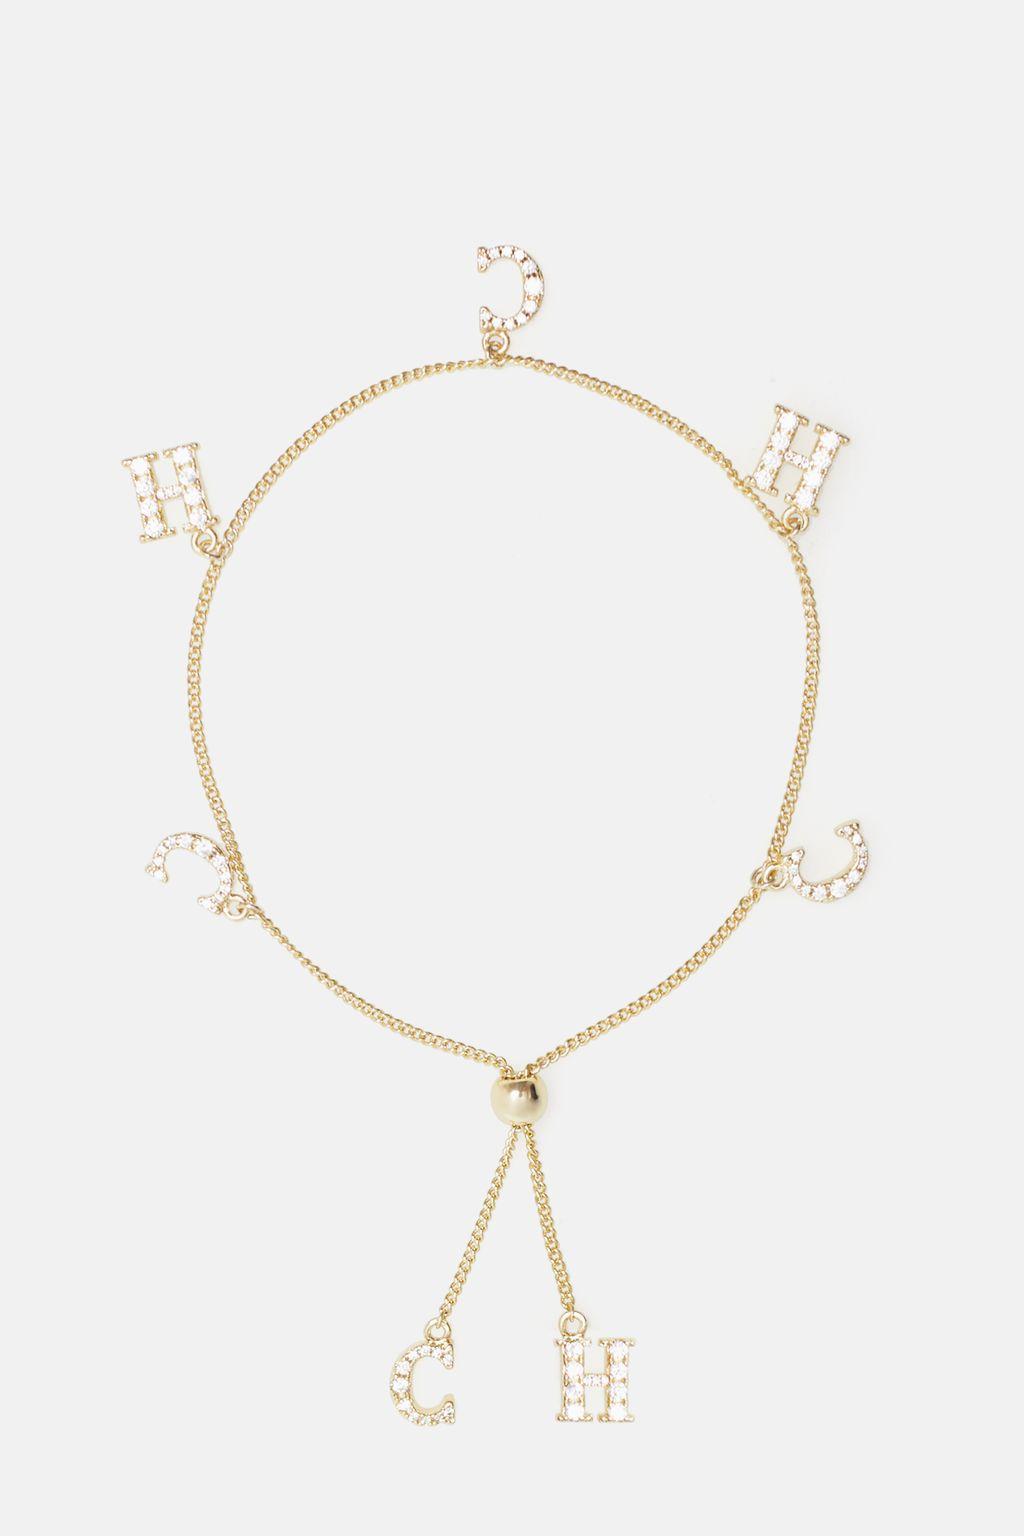 Petite CH bracelet